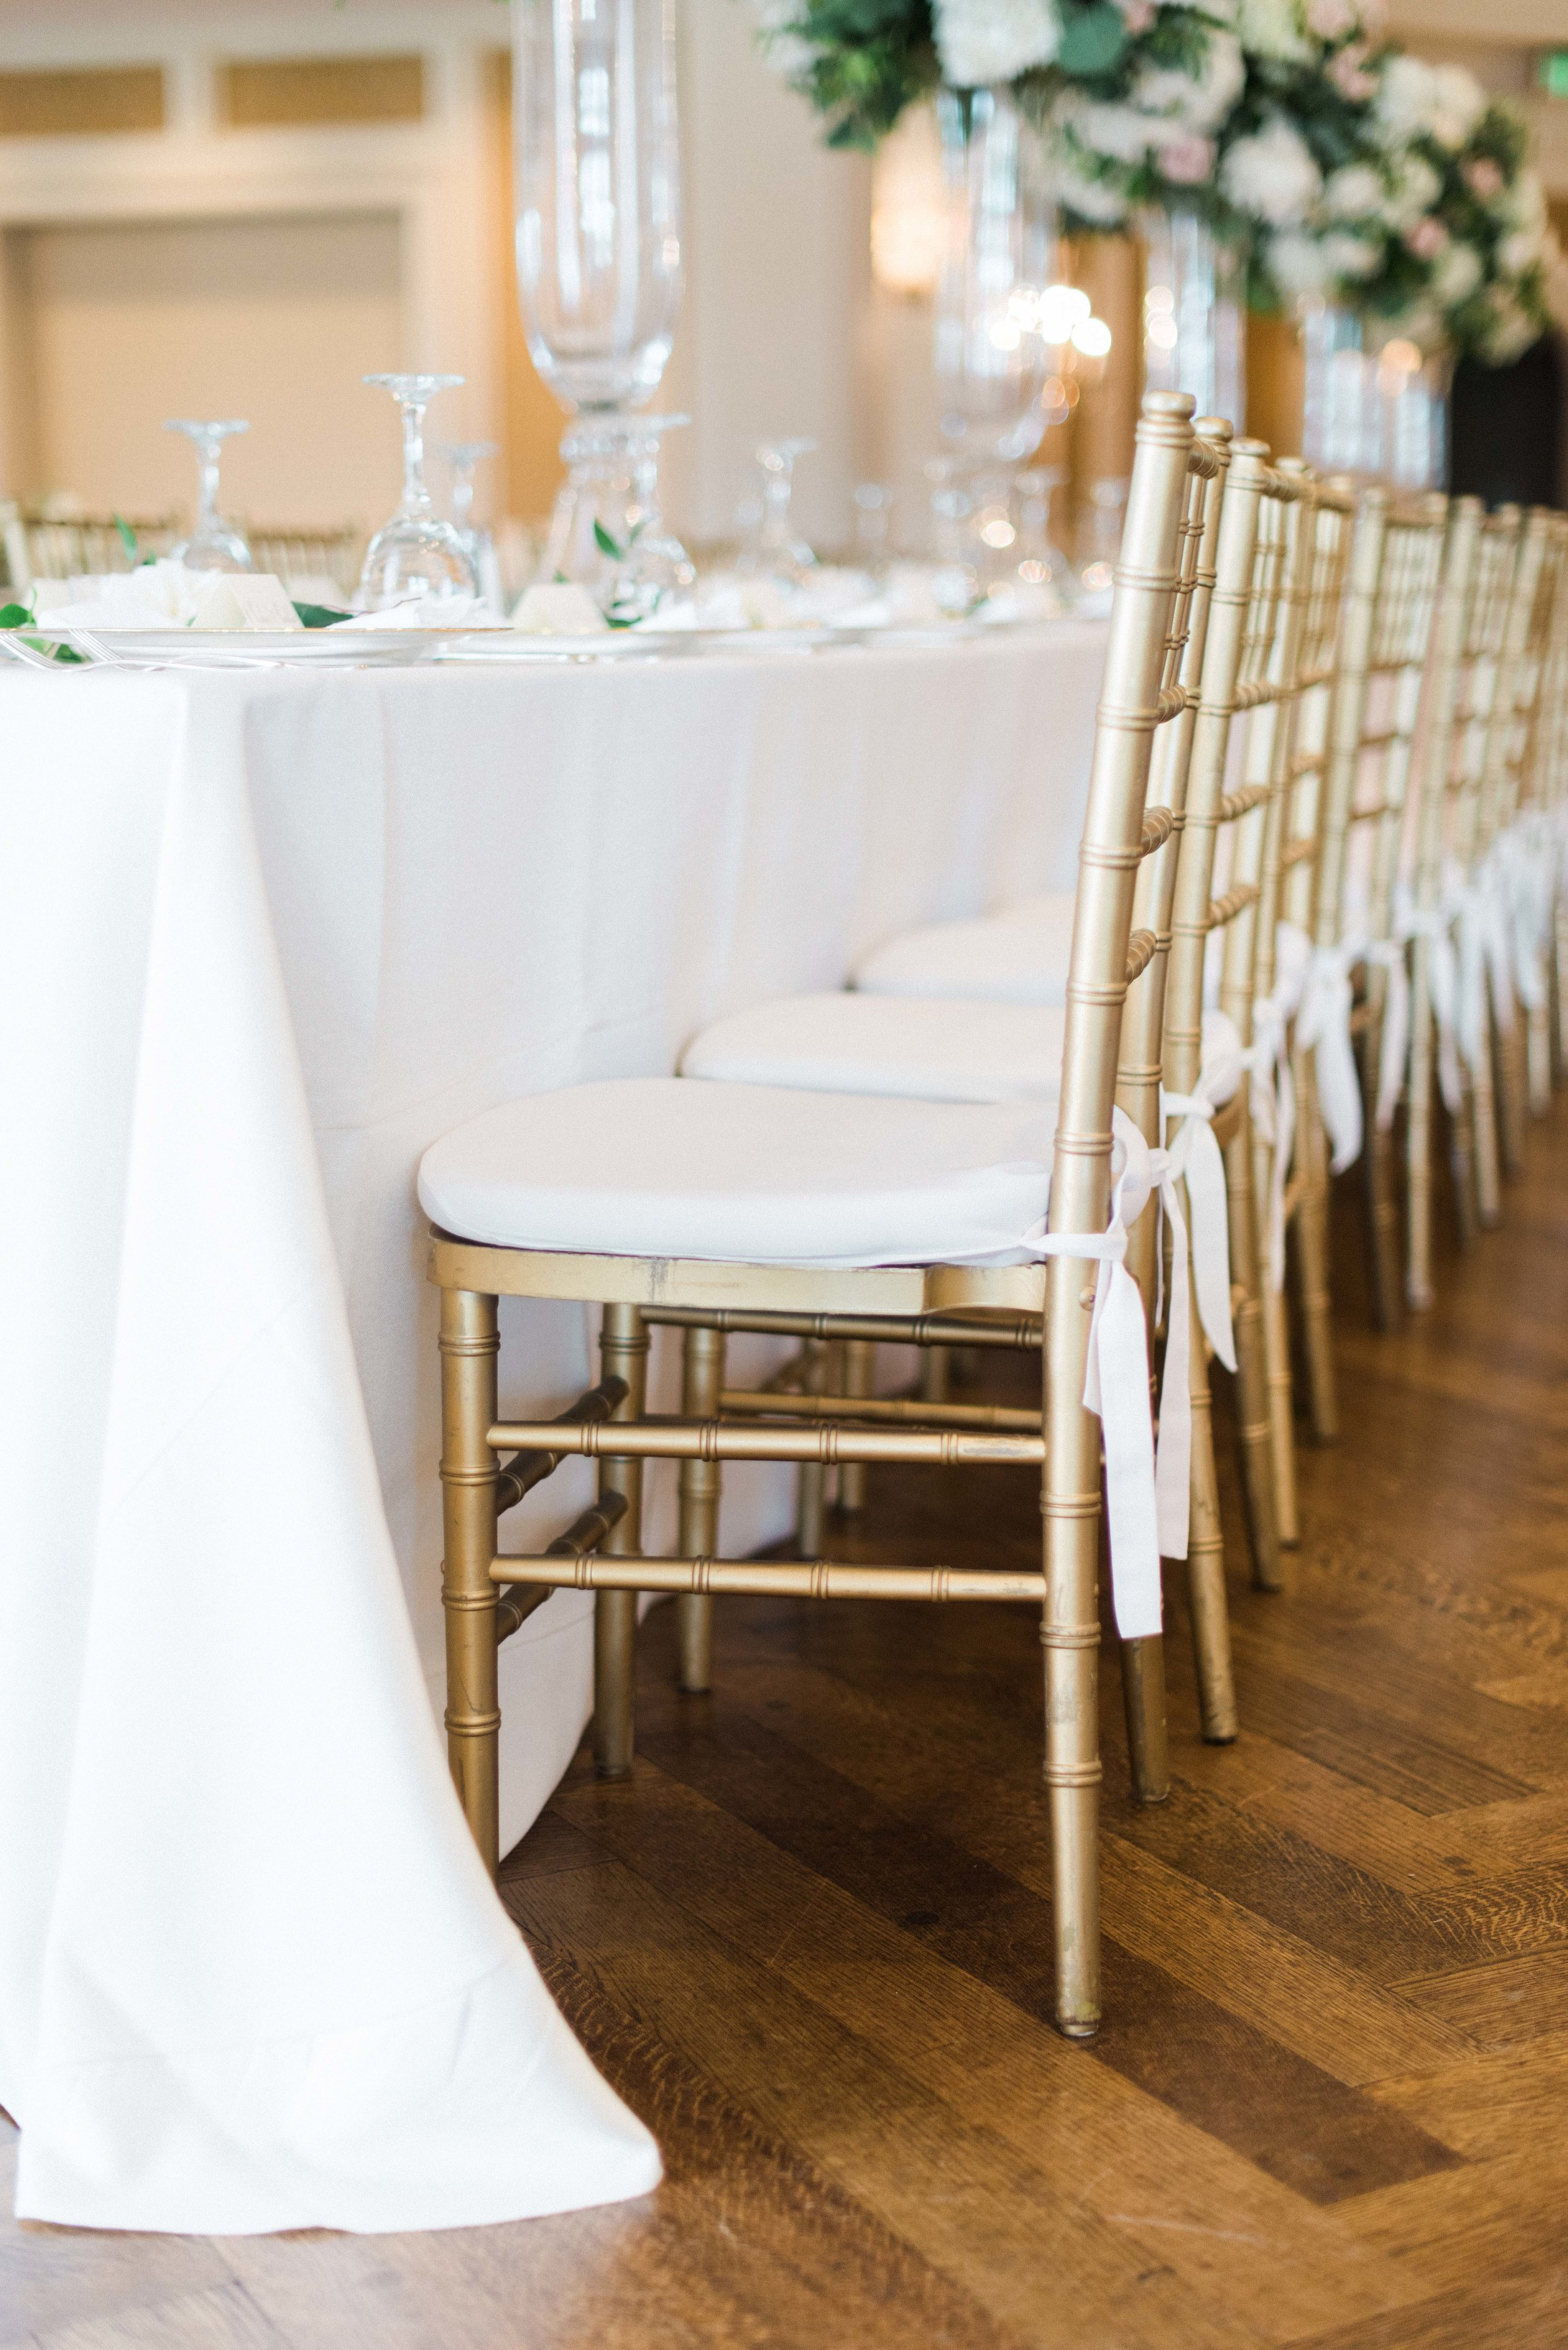 Fine-Art-Film-Houston-Wedding-Photographer-Best-Top-Luxury-Texas-Austin-Dallas-Destination-Dana-Fernandez-Photography-River-Oaks-Country-Club-South-Main-Baptist-Ceremony-Reception-Wedding-17.jpg